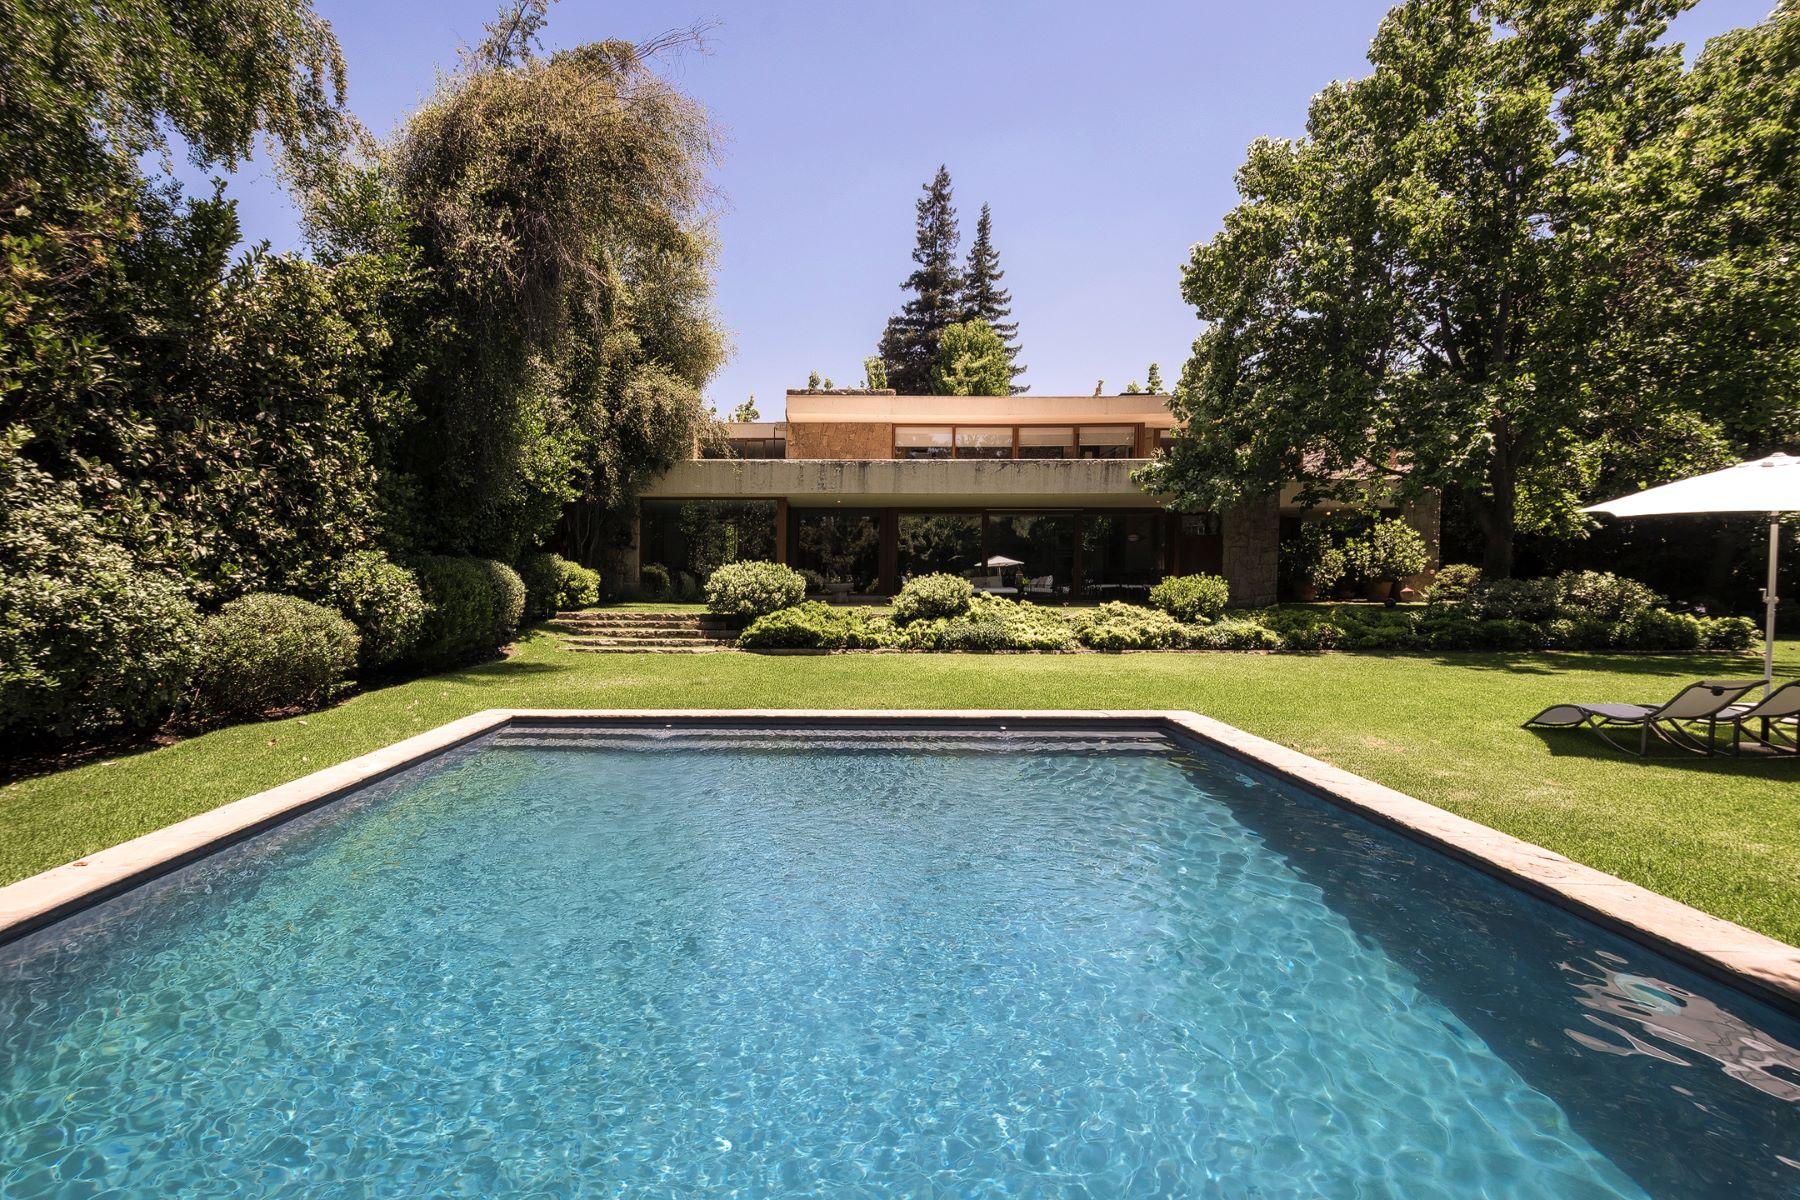 Nhà ở một gia đình vì Bán tại Splendid Modern House in Exclusive Condominium Lomas de la Dehesa Santiago, Region Metropolitana De Santiago, 1234 Chi-Lê